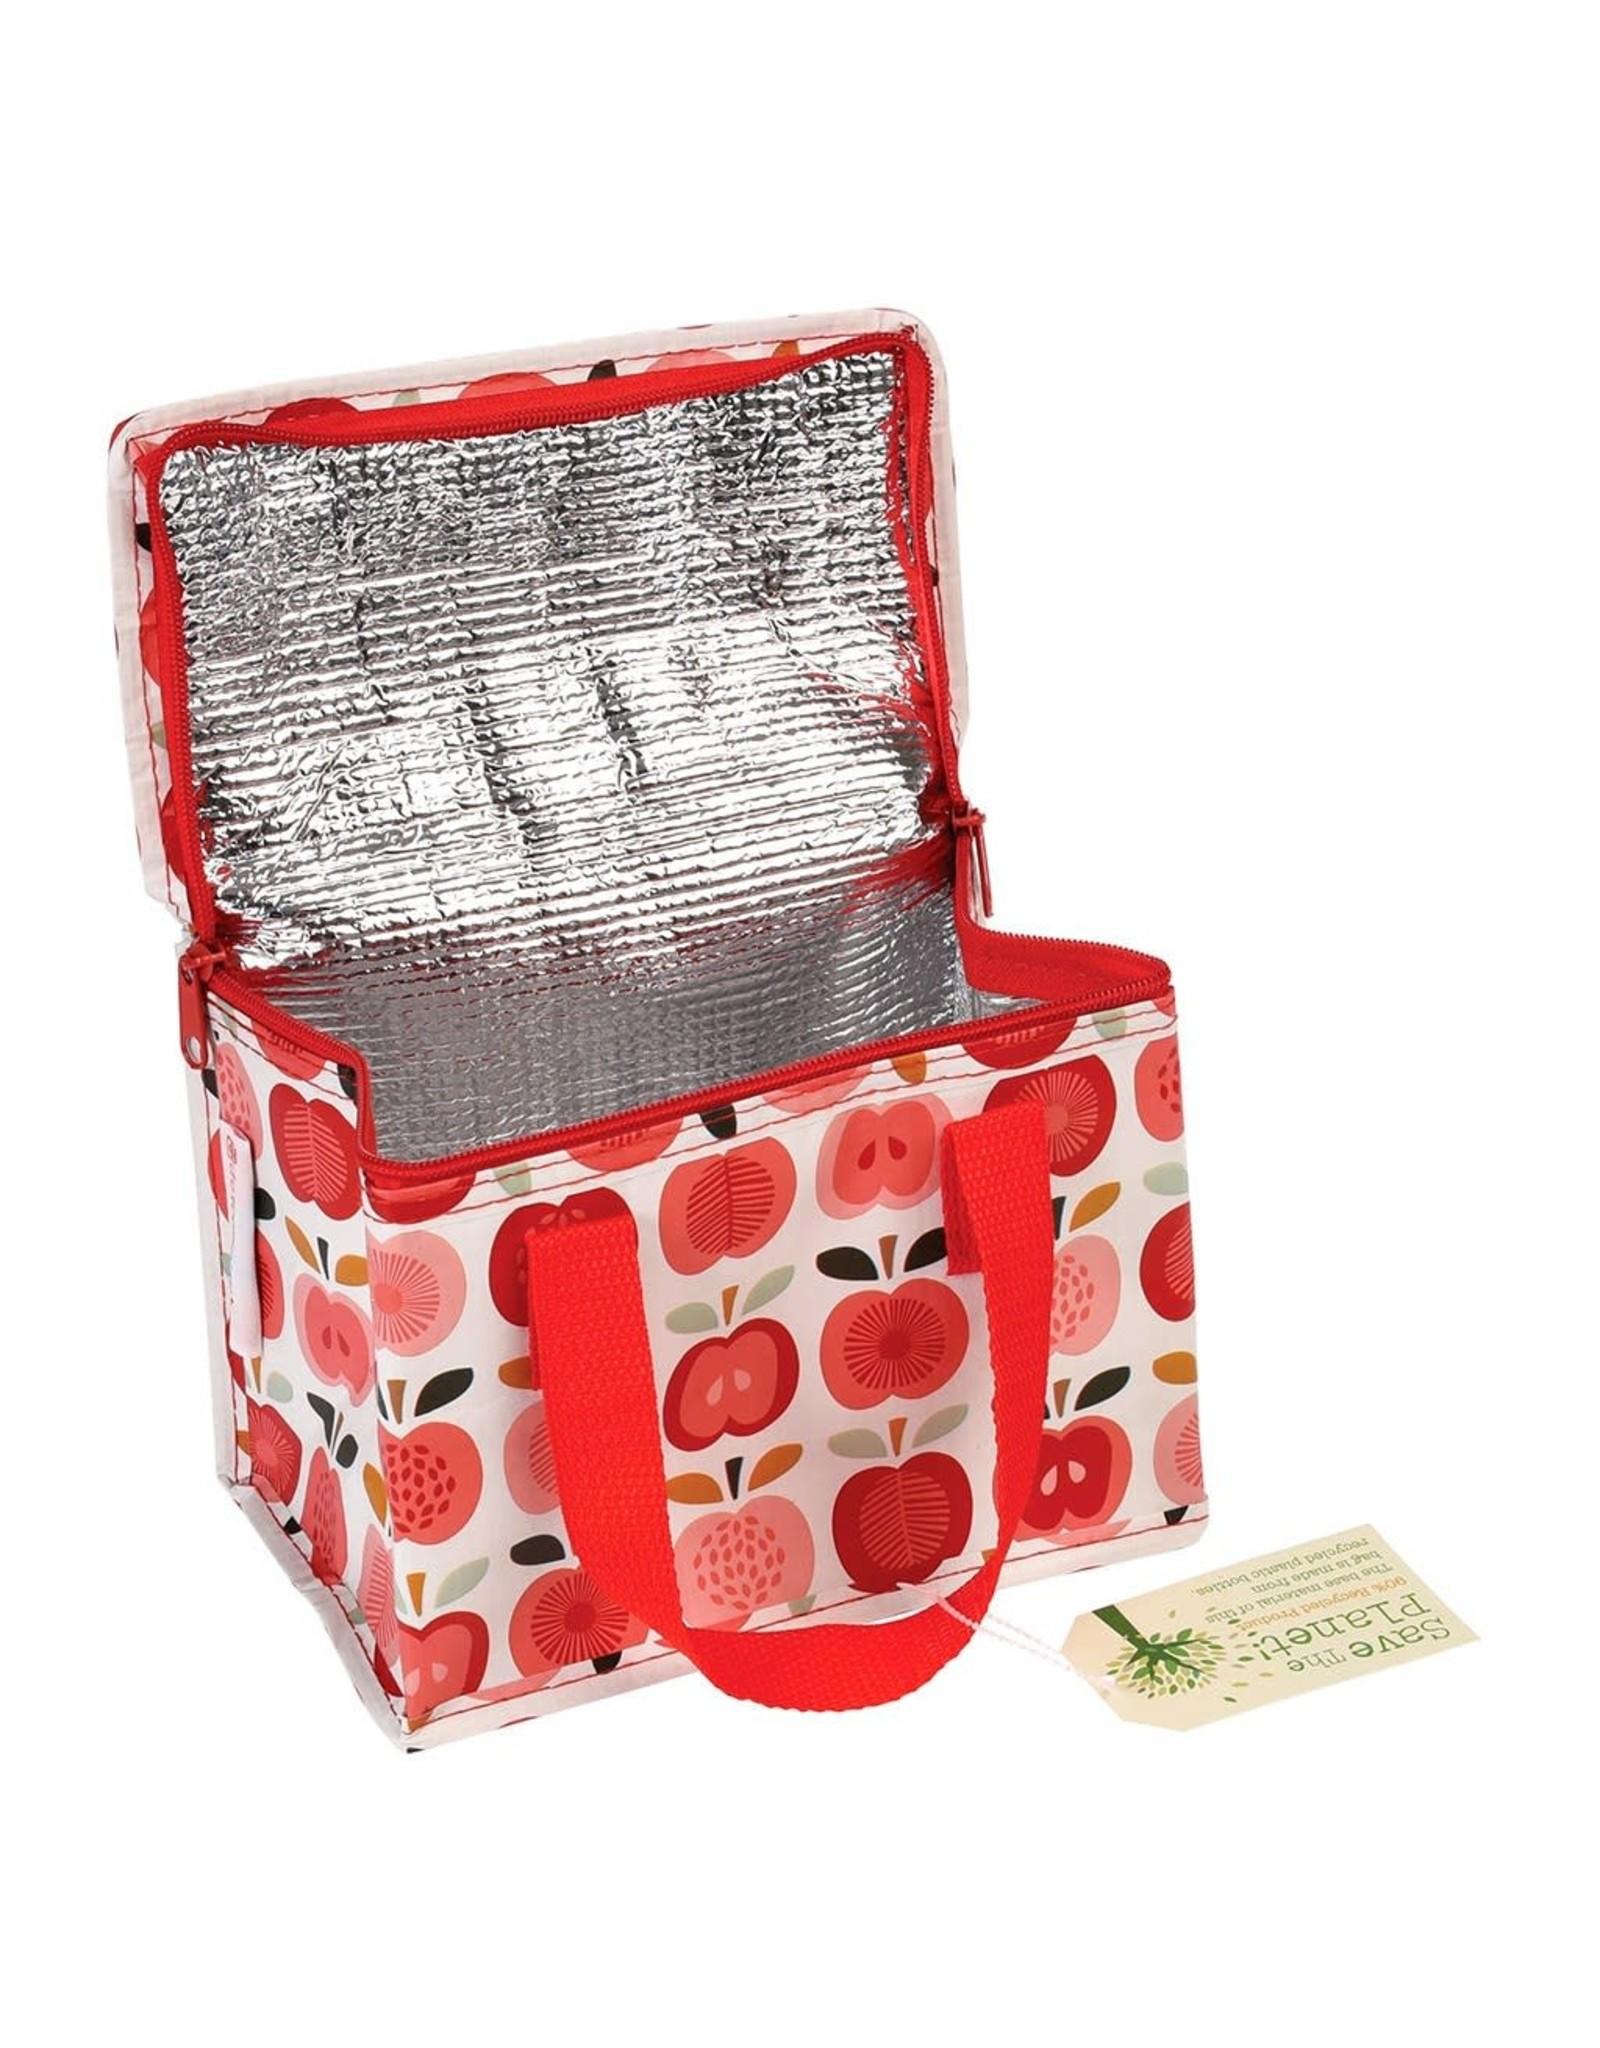 REX London Lunch Bag, Vintage Apple